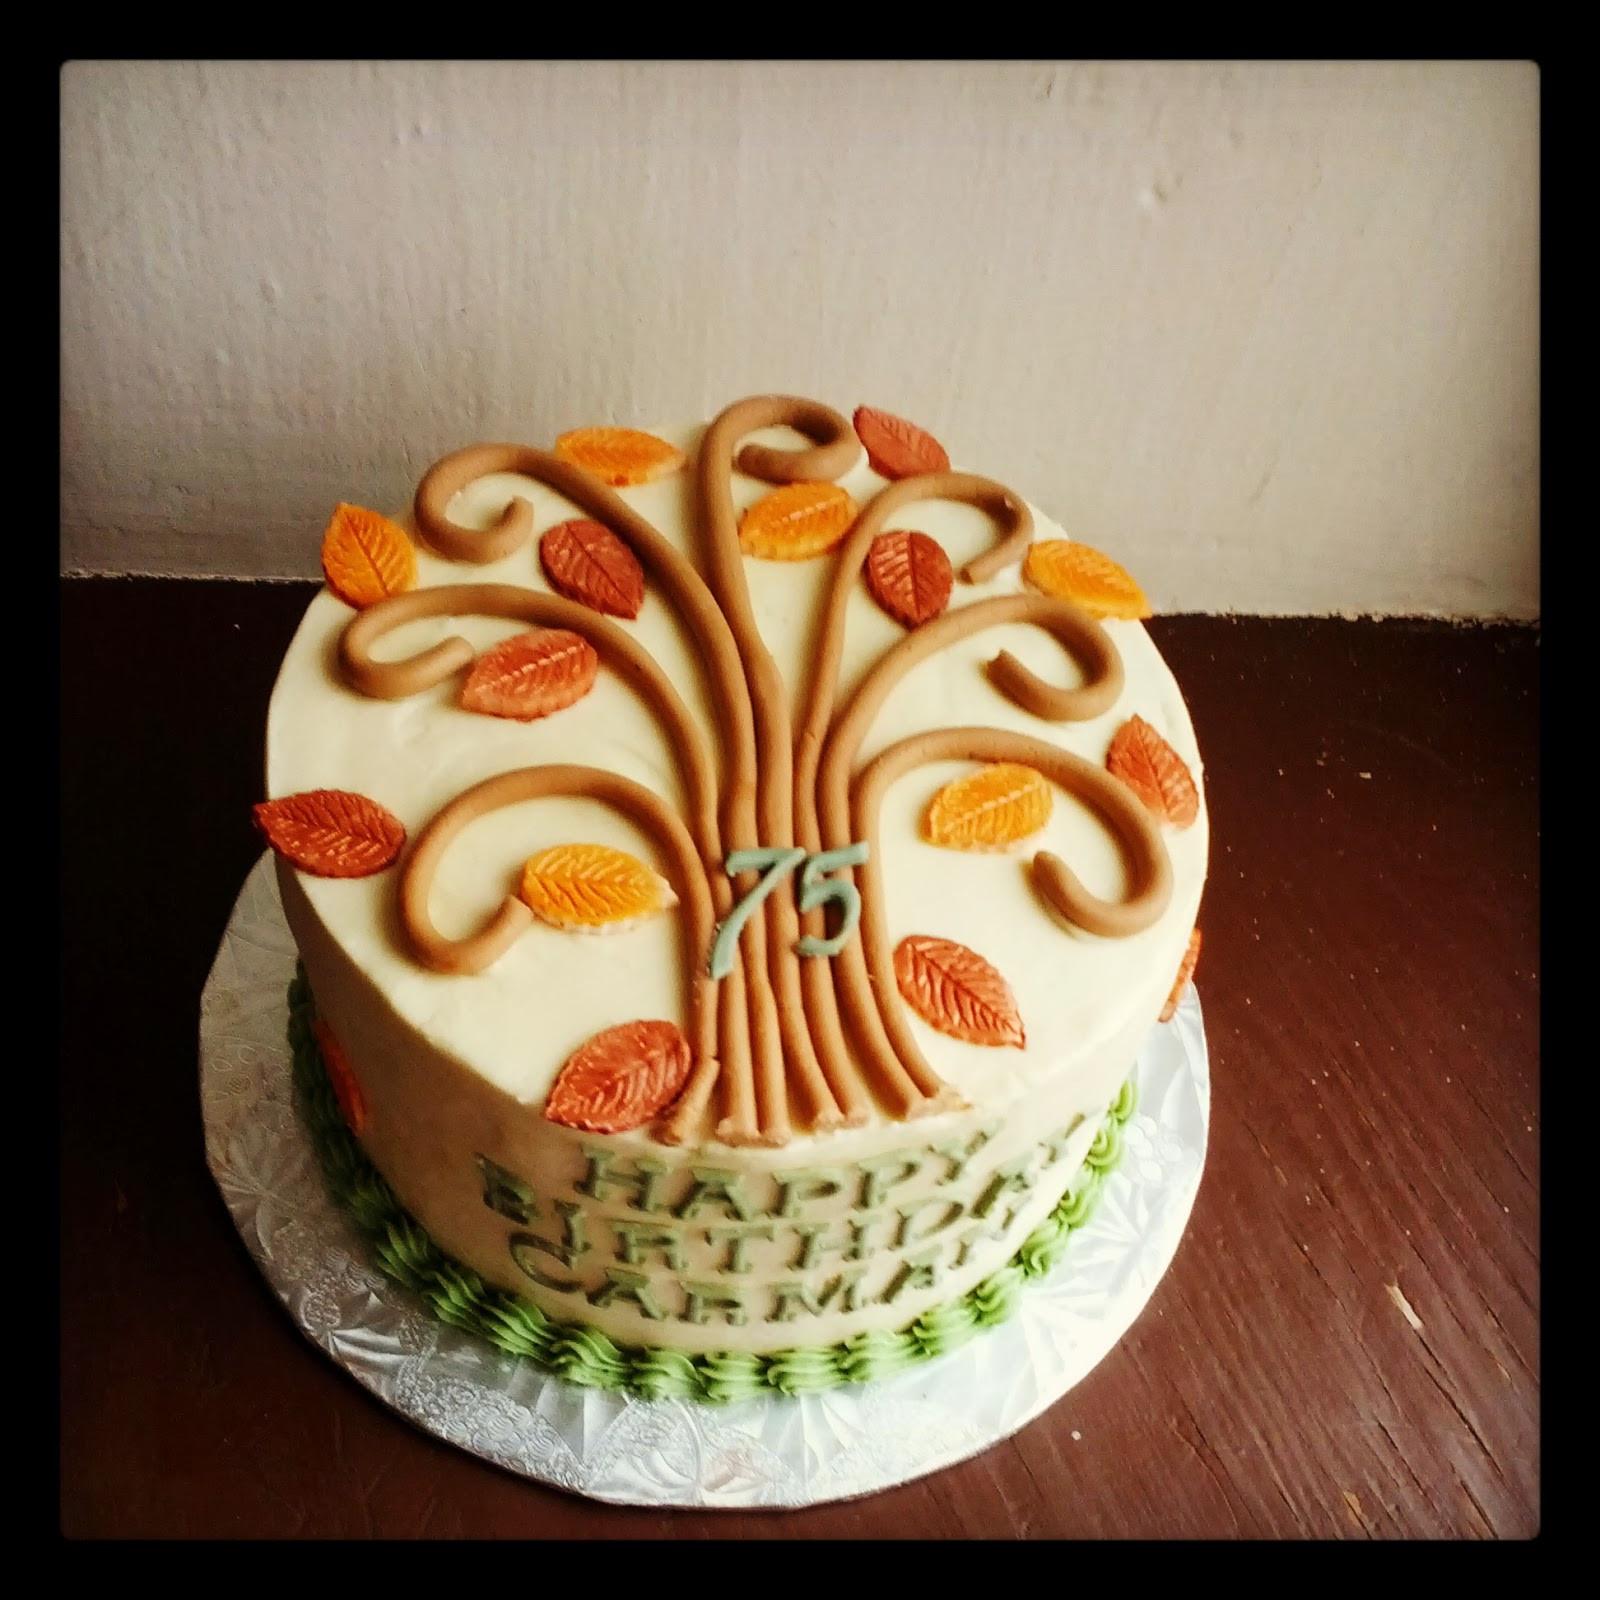 Fall Themed Birthday Cake  Second Generation Cake Design Fall Themed Birthday Cake